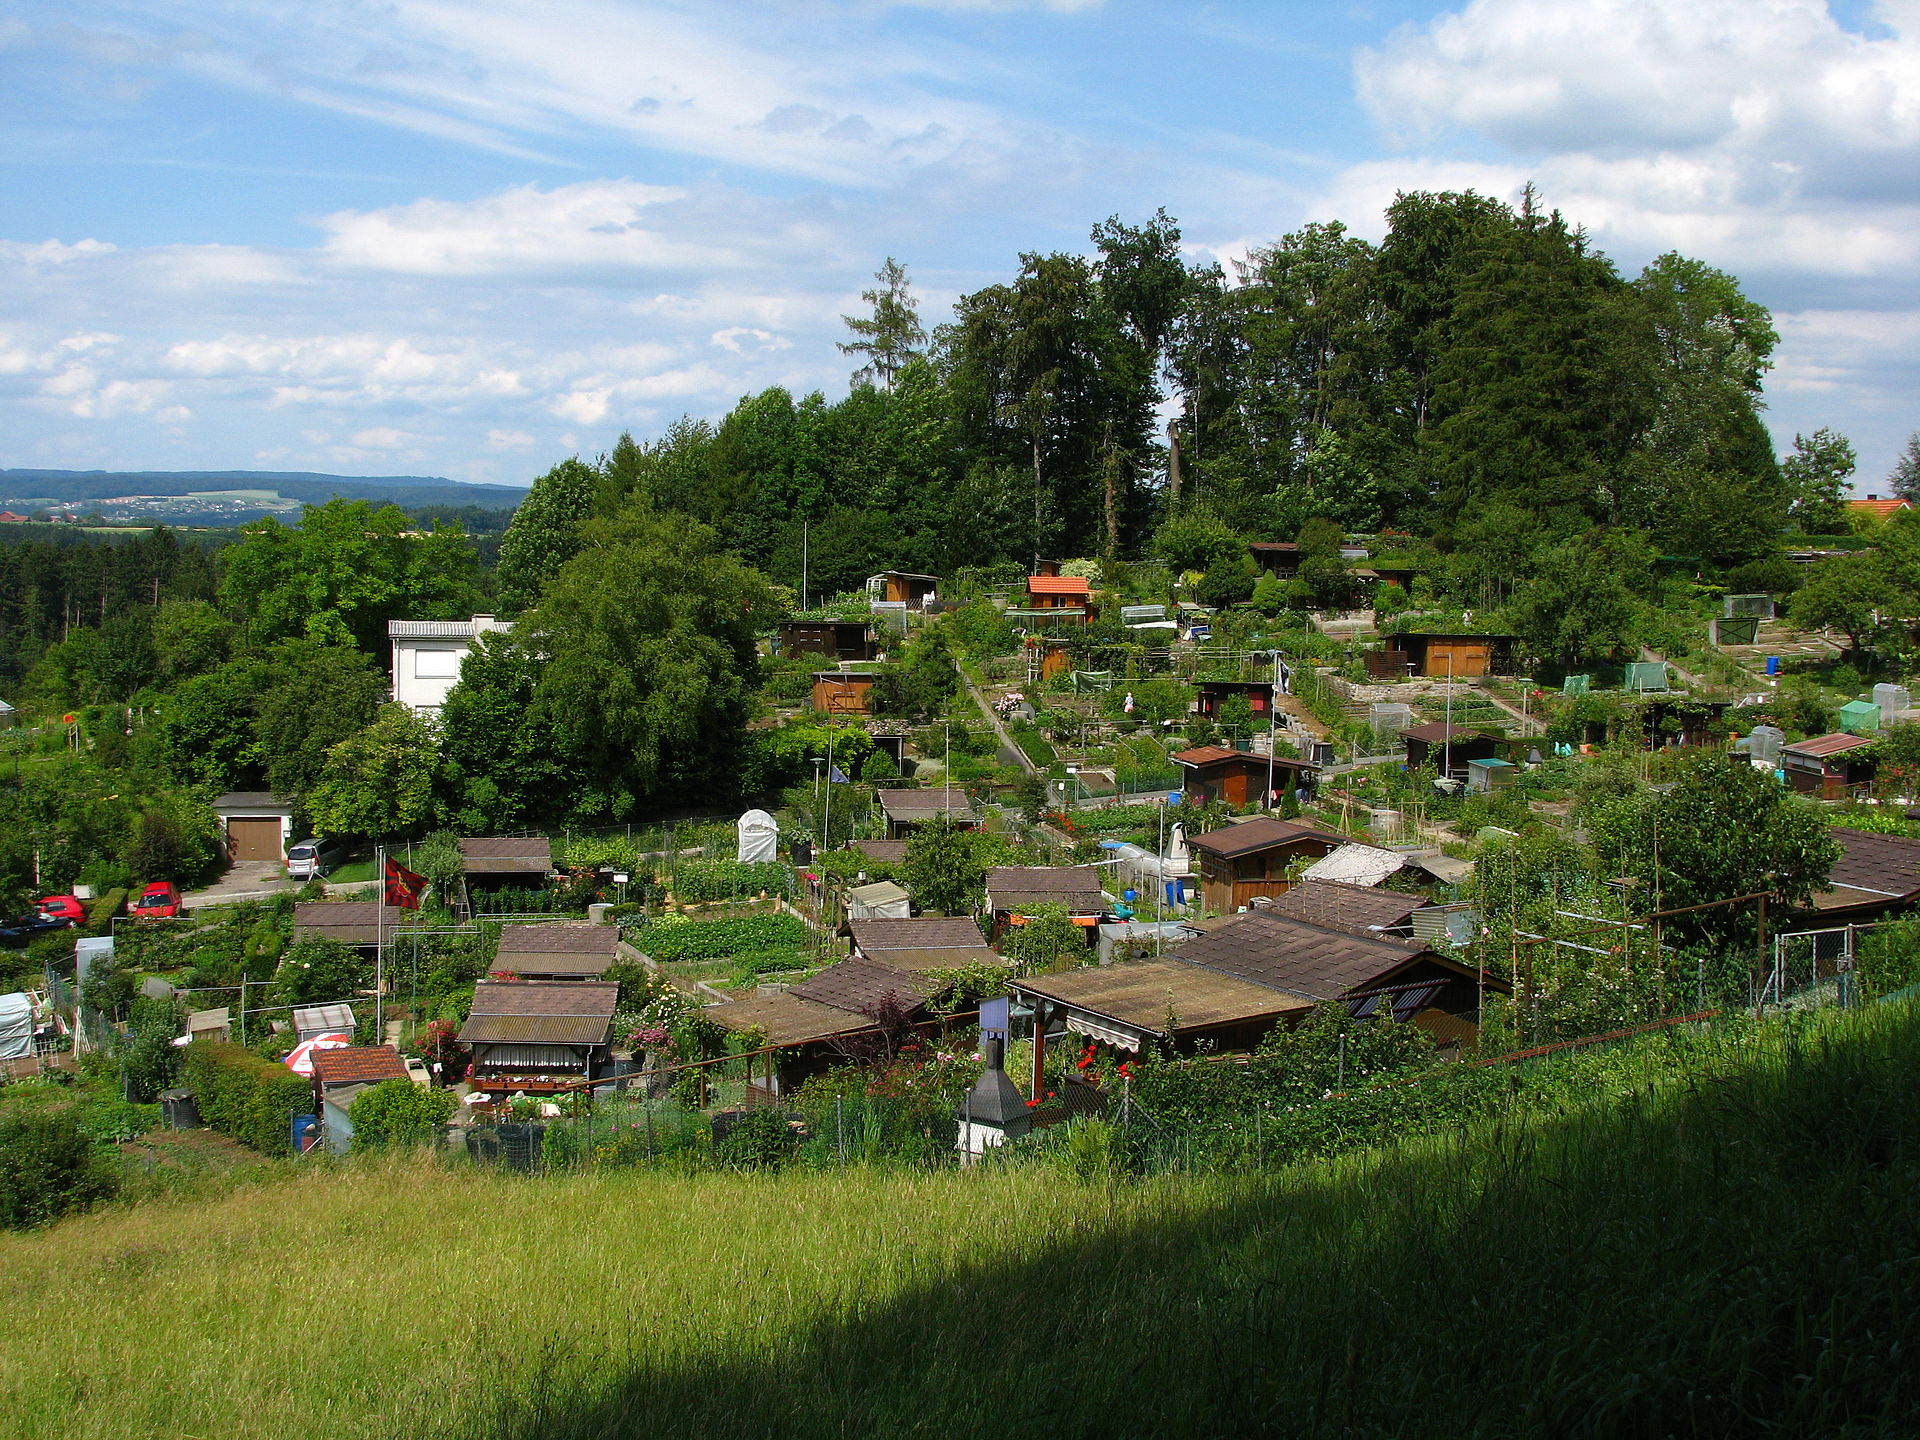 Allotment gardening wikipedia - Schrebergarten anlegen ...